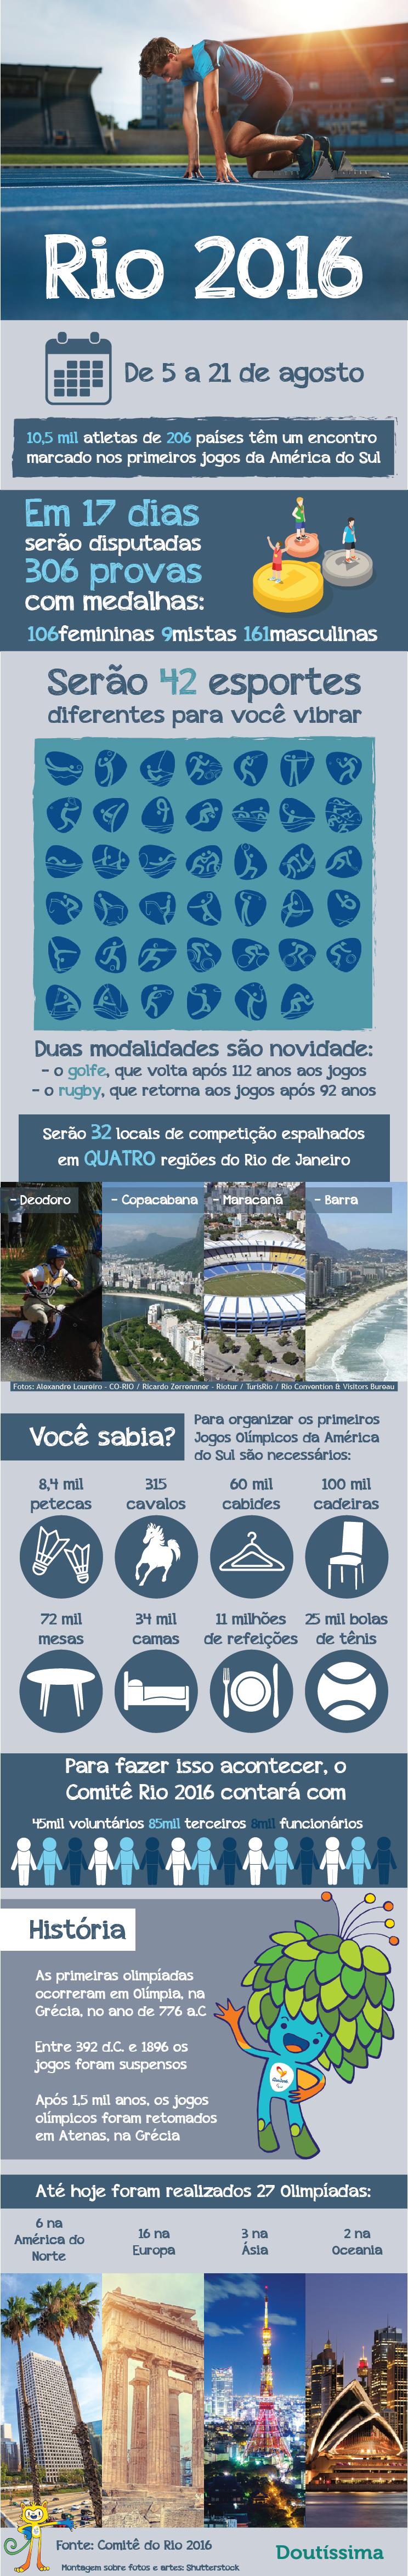 Jogos Olímpicos 2016 infografico doutissima